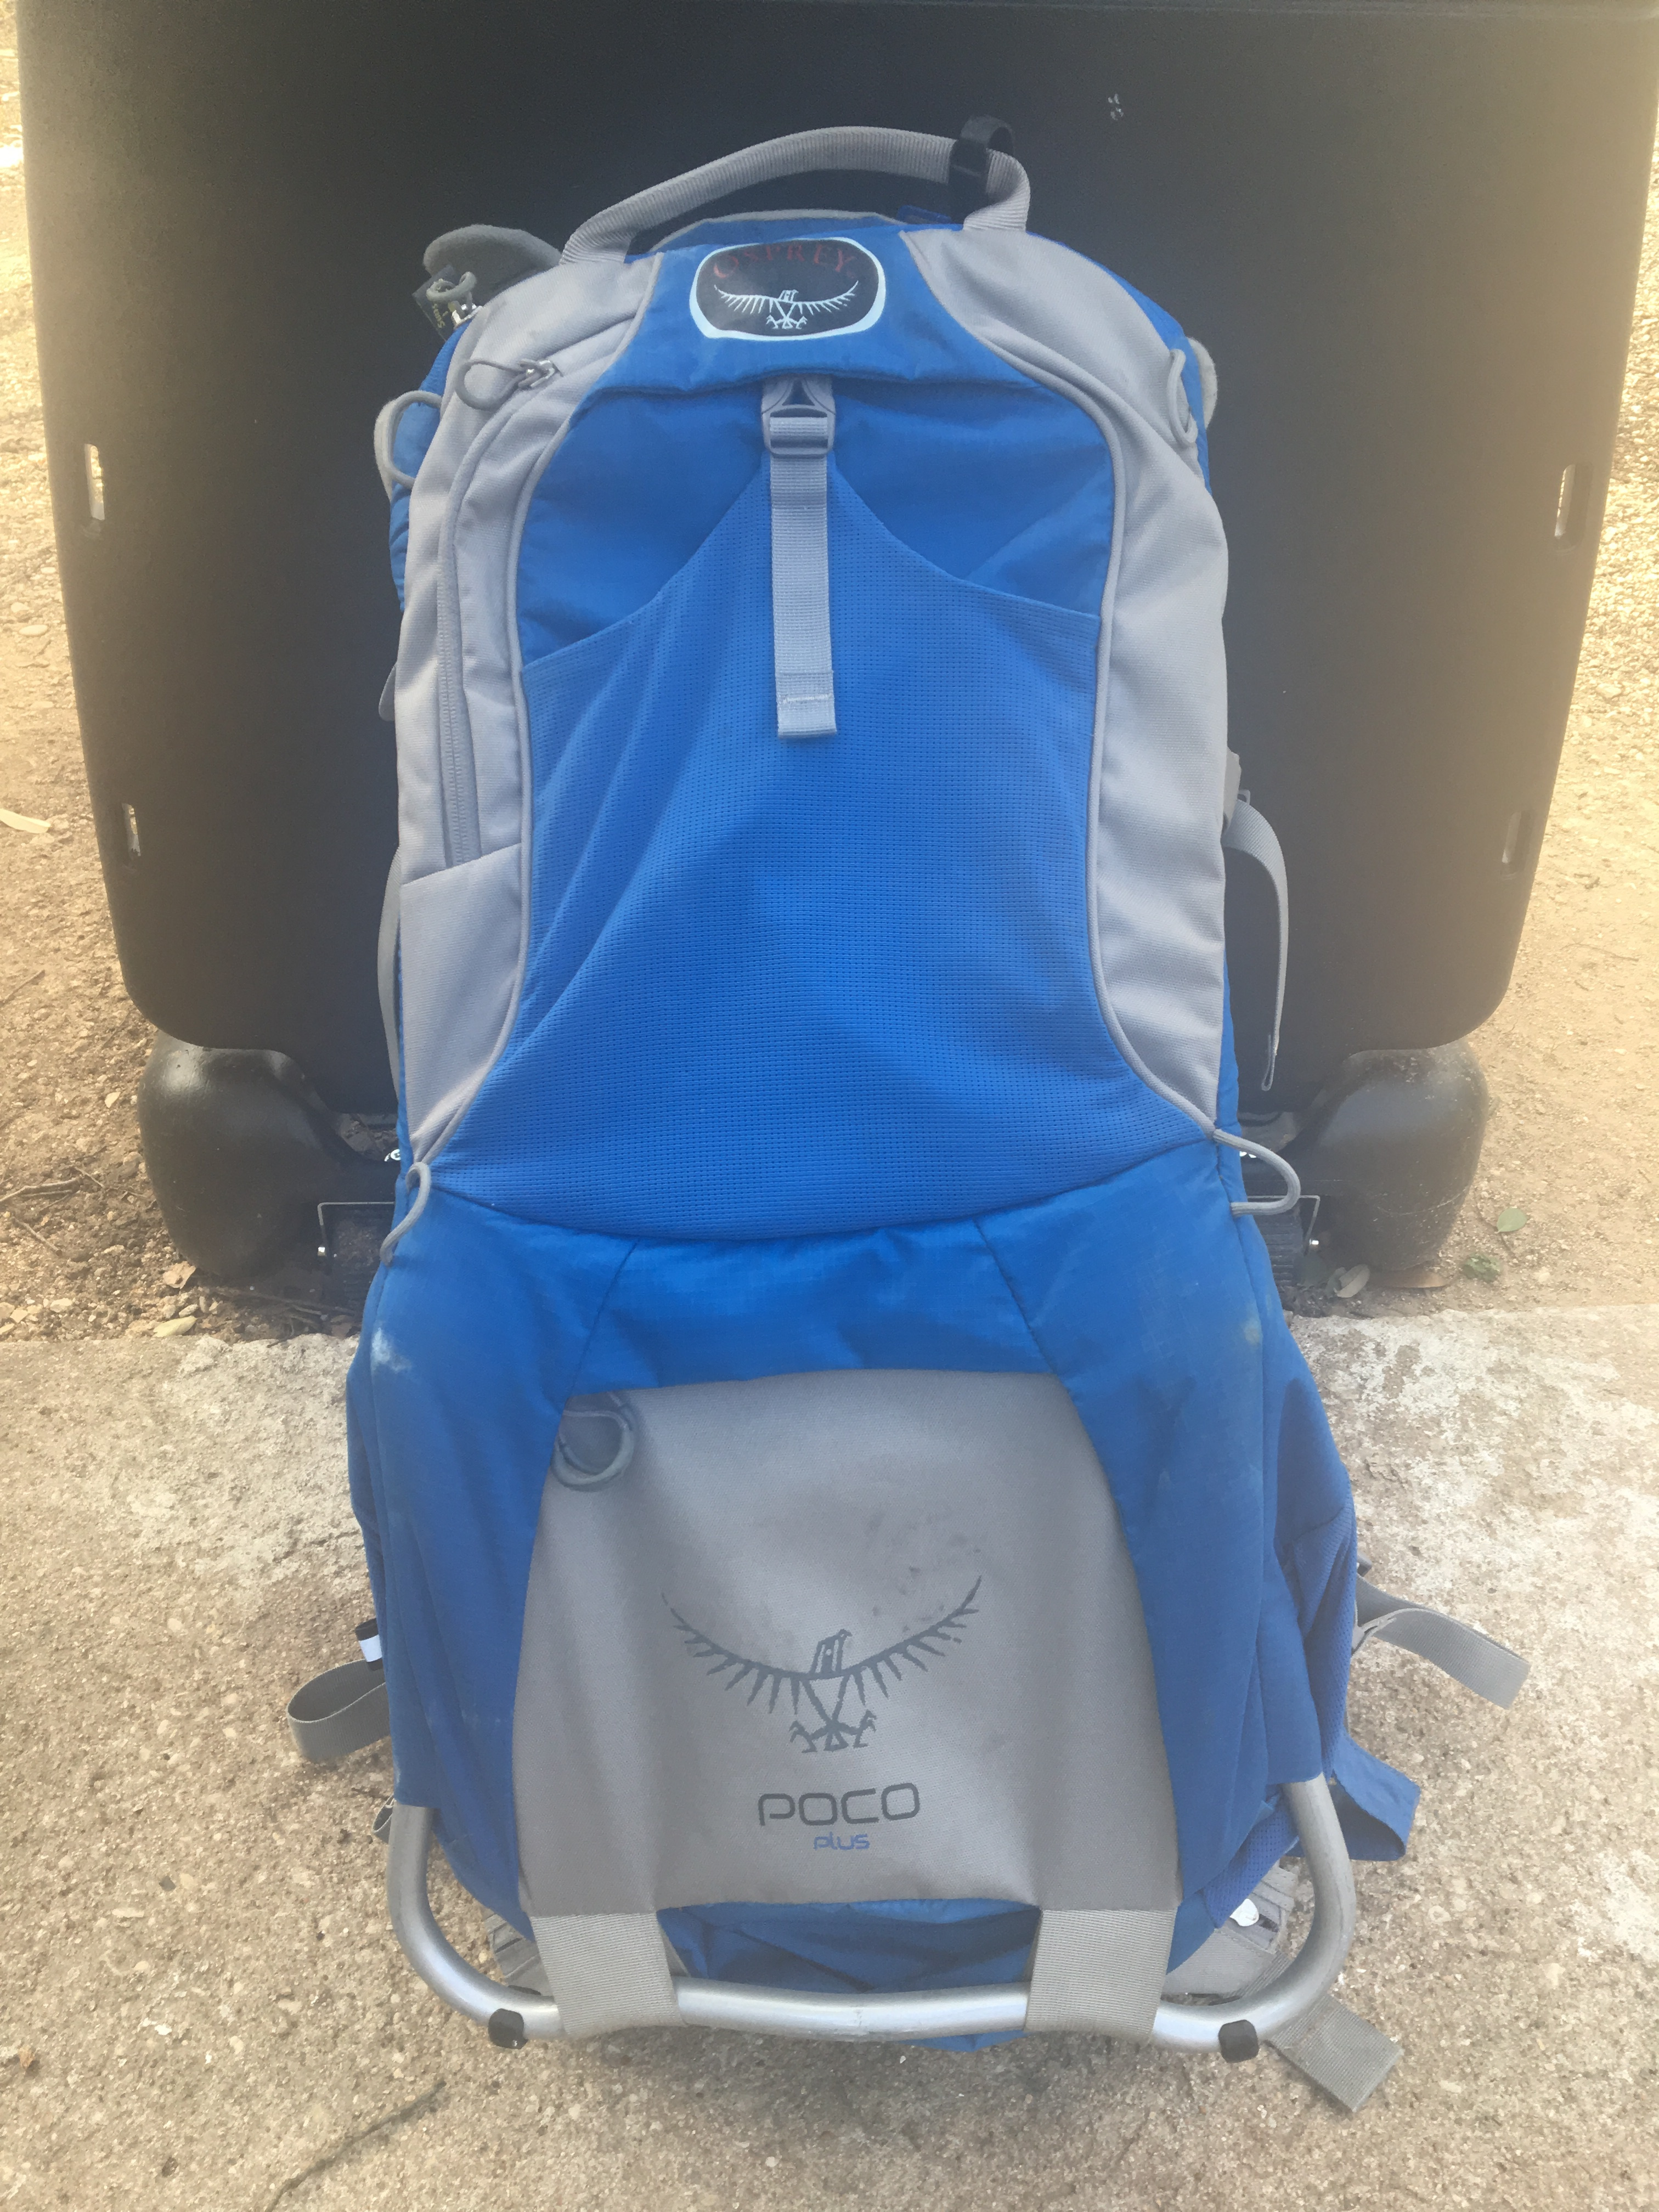 Child Carrier Backpack rental in Austin TX